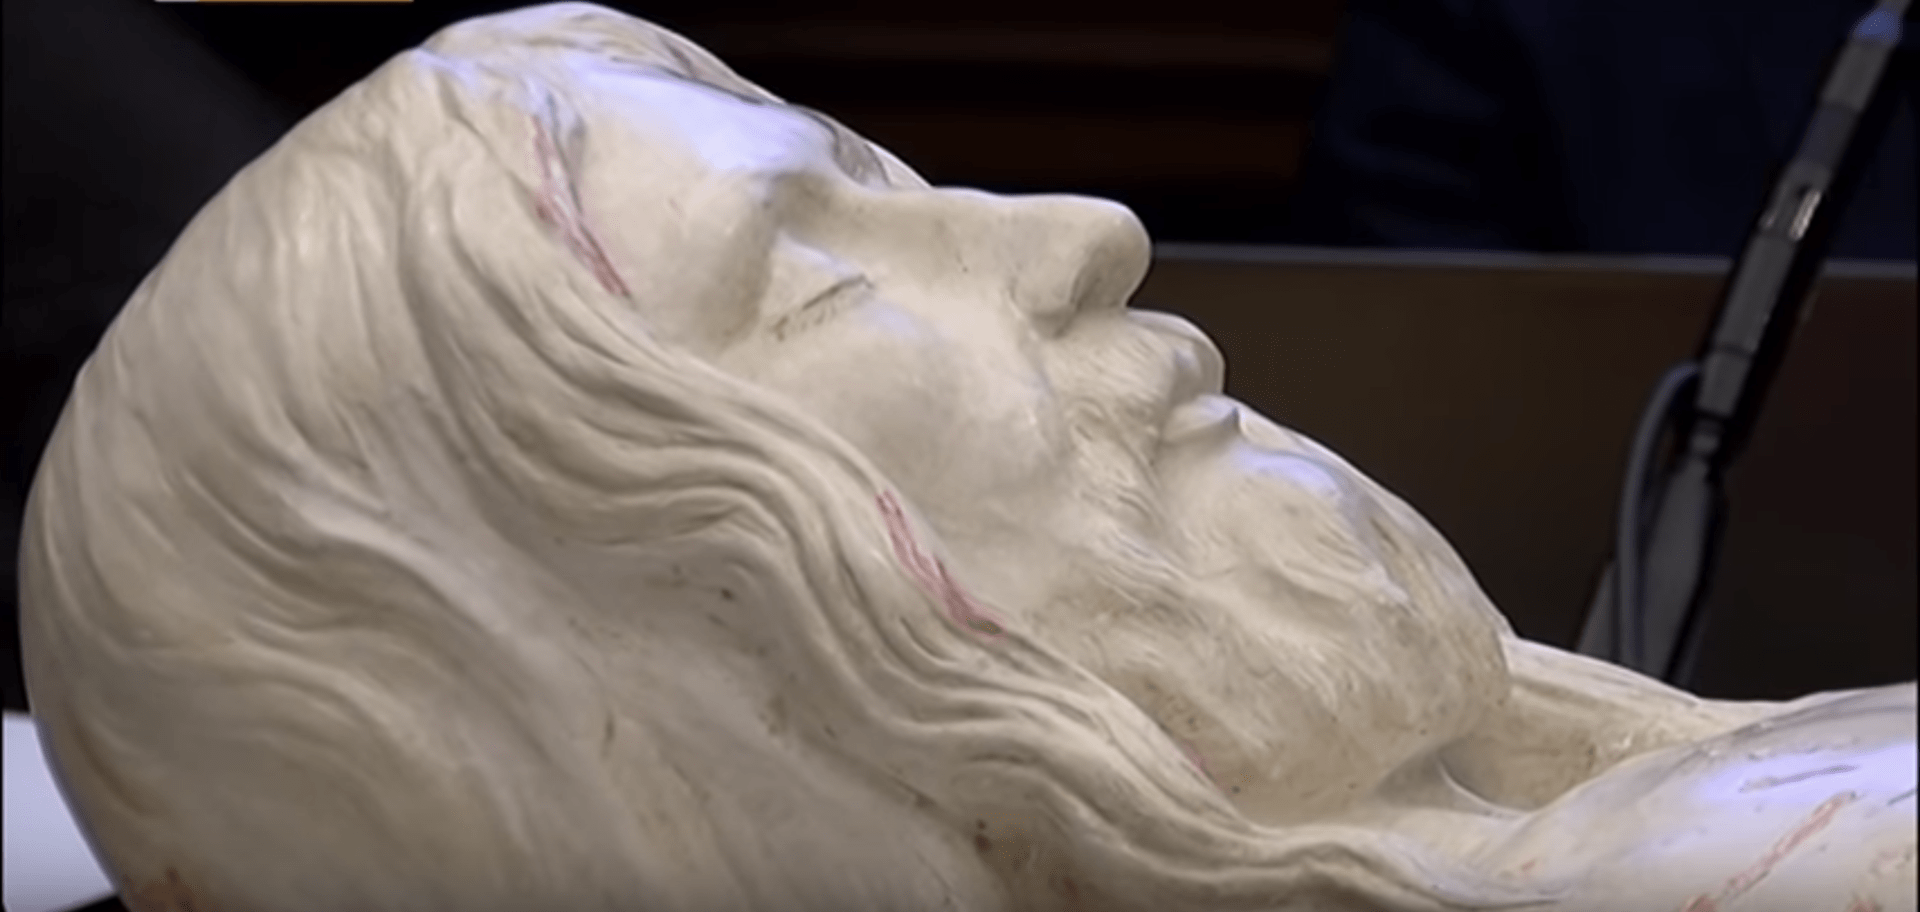 Professor Creates 3D Image of Christ from Shroud of Turin